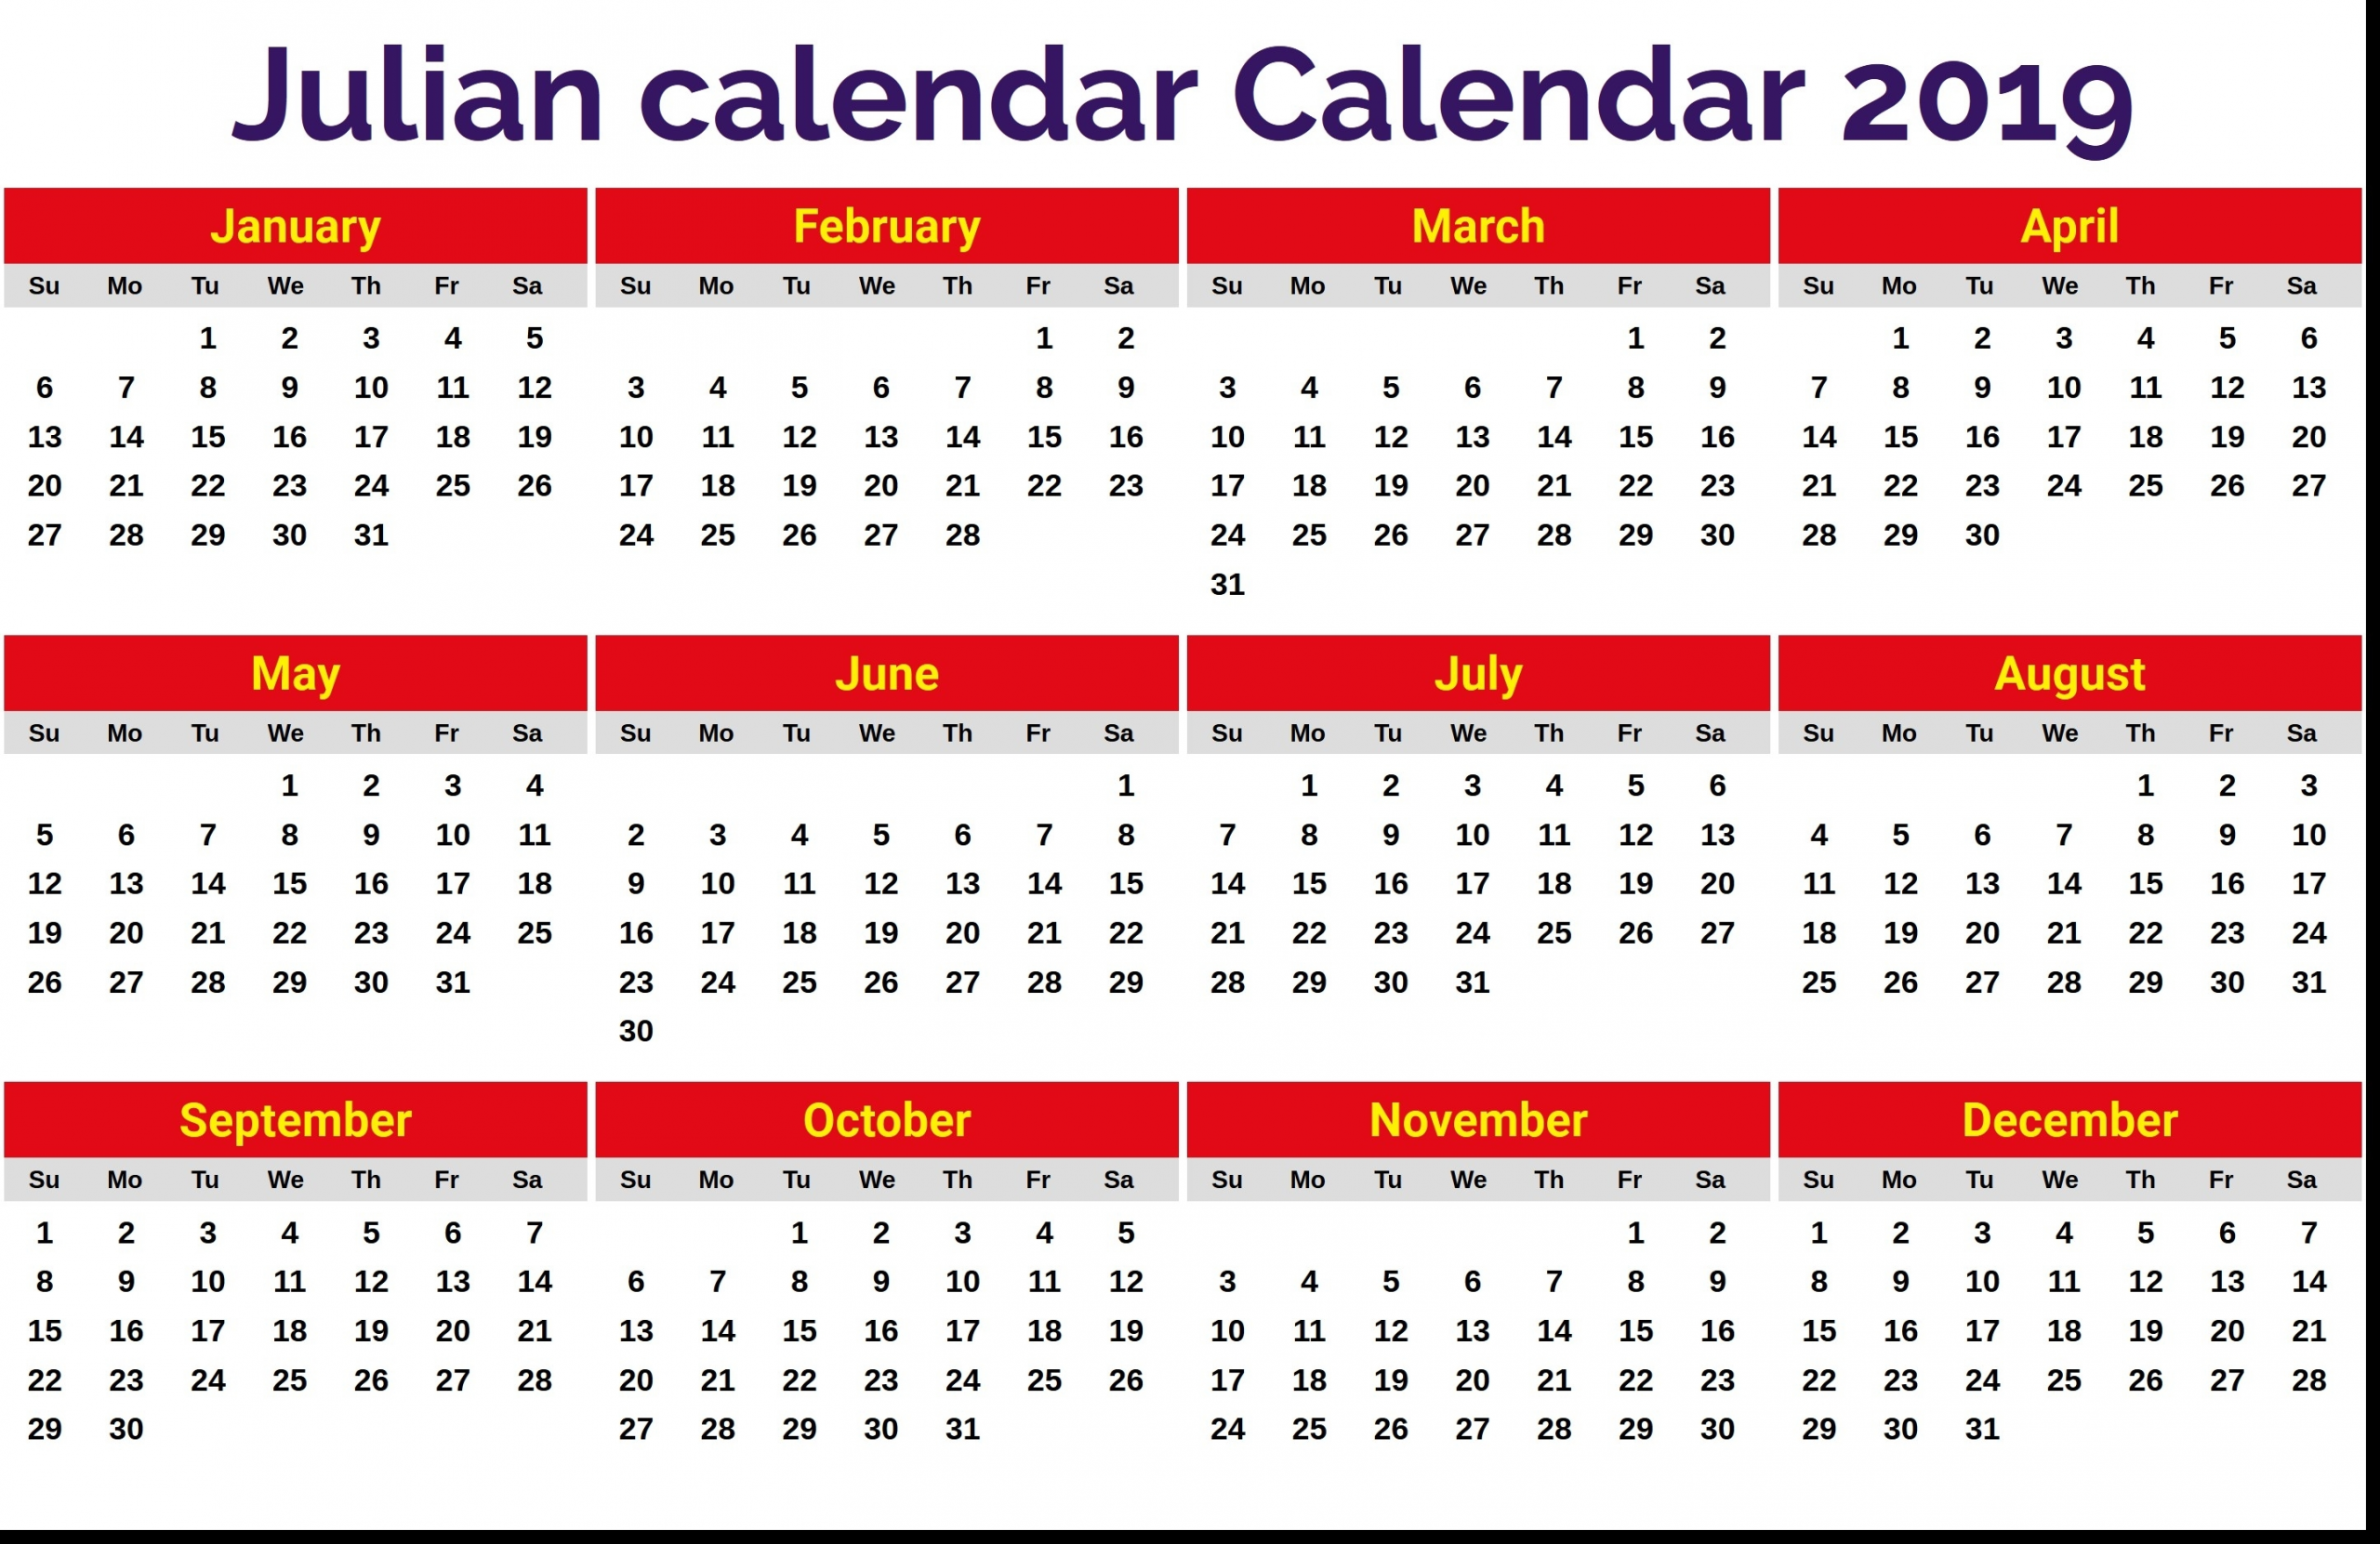 Monthly Calendar With Julian Dates 2020 | Example Calendar